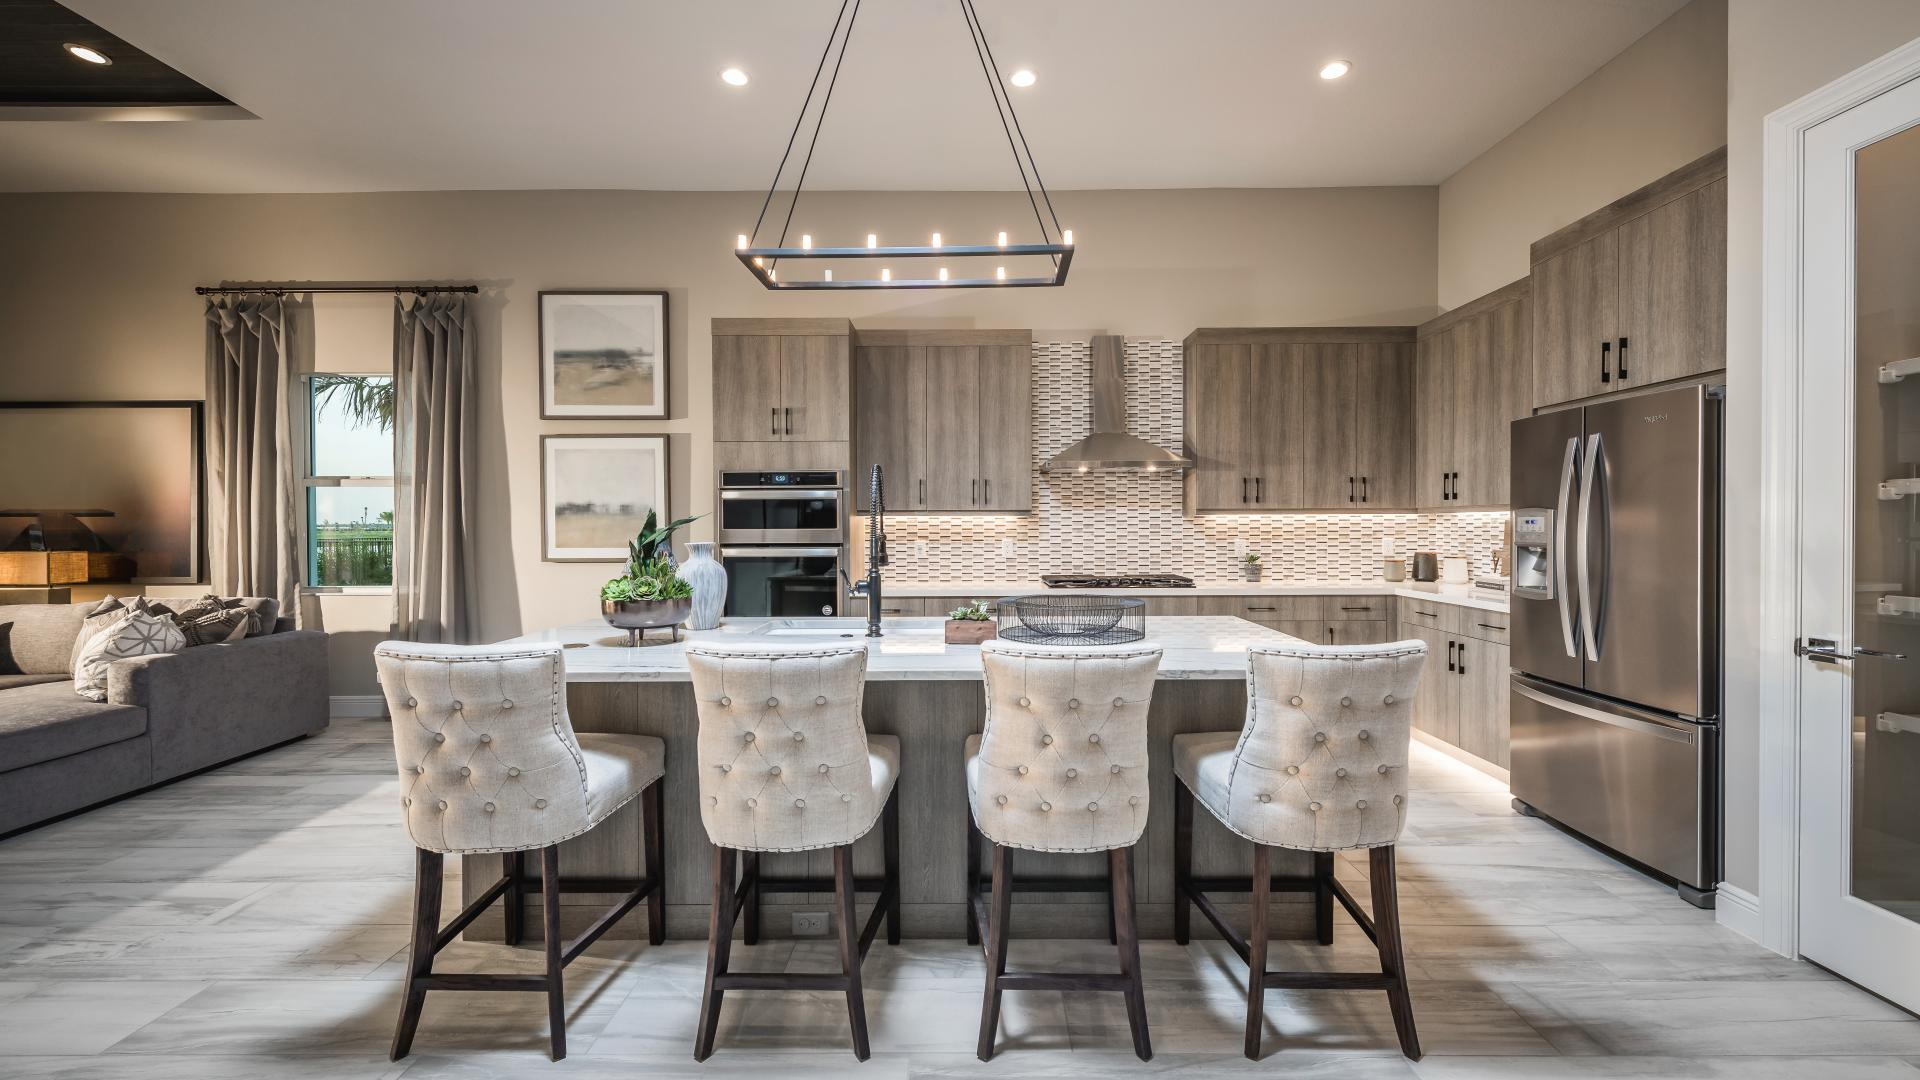 Spacious modern kitchens with abundant storage